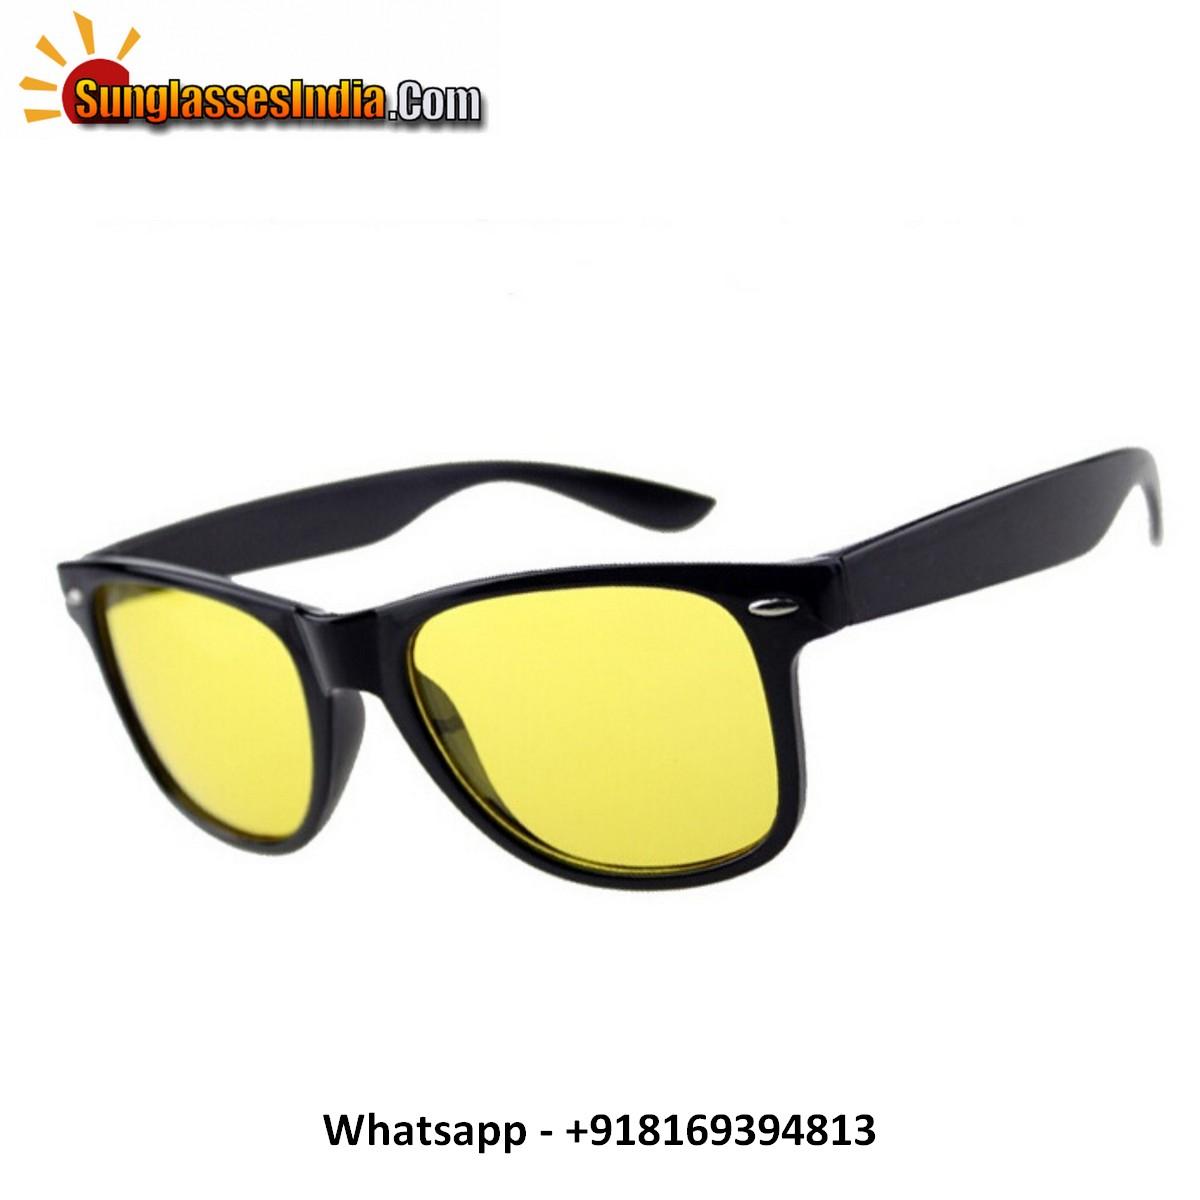 Night Driving Wayfare Sunglasses